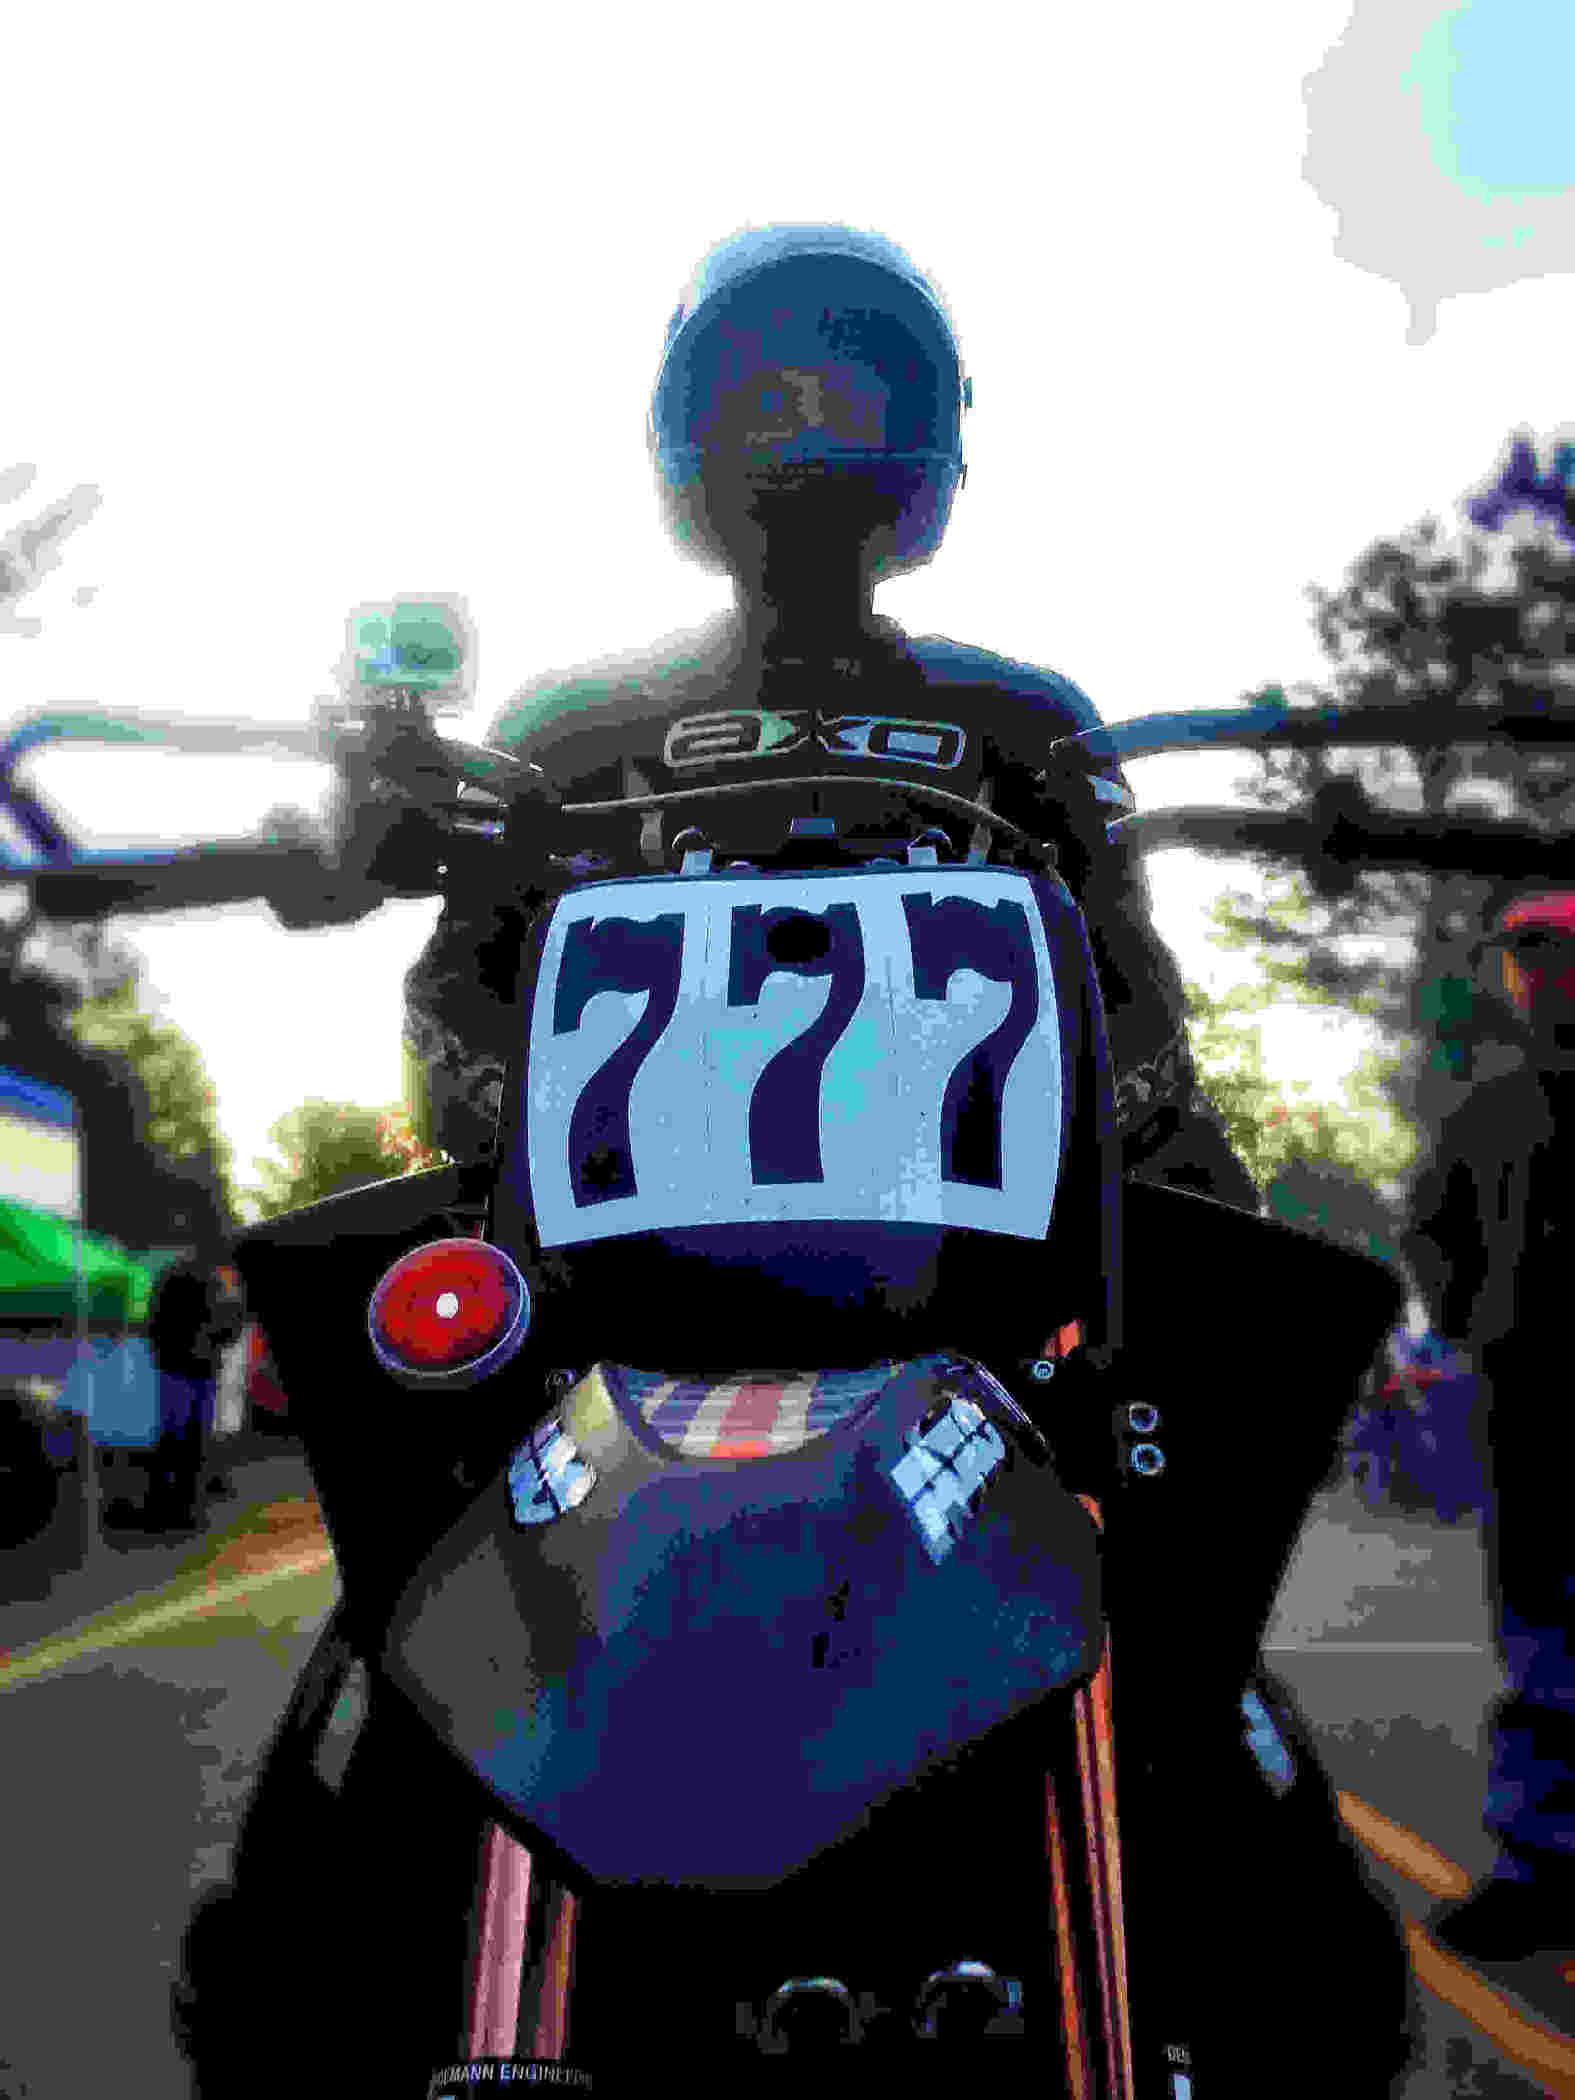 Jeff Clark #777 at PPIHC